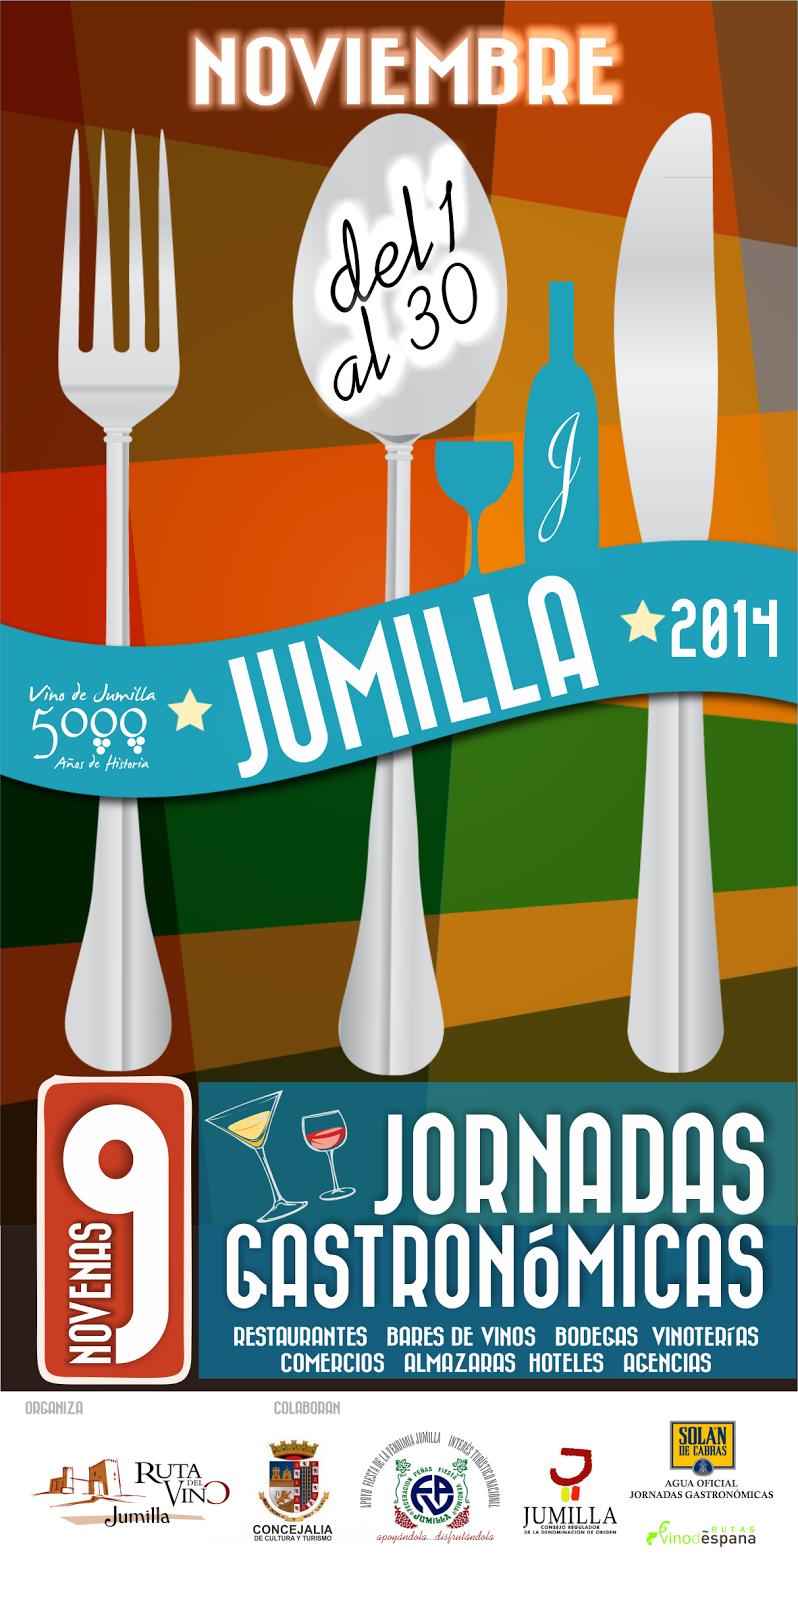 9ª Jornadas Gastronómicas de Jumilla